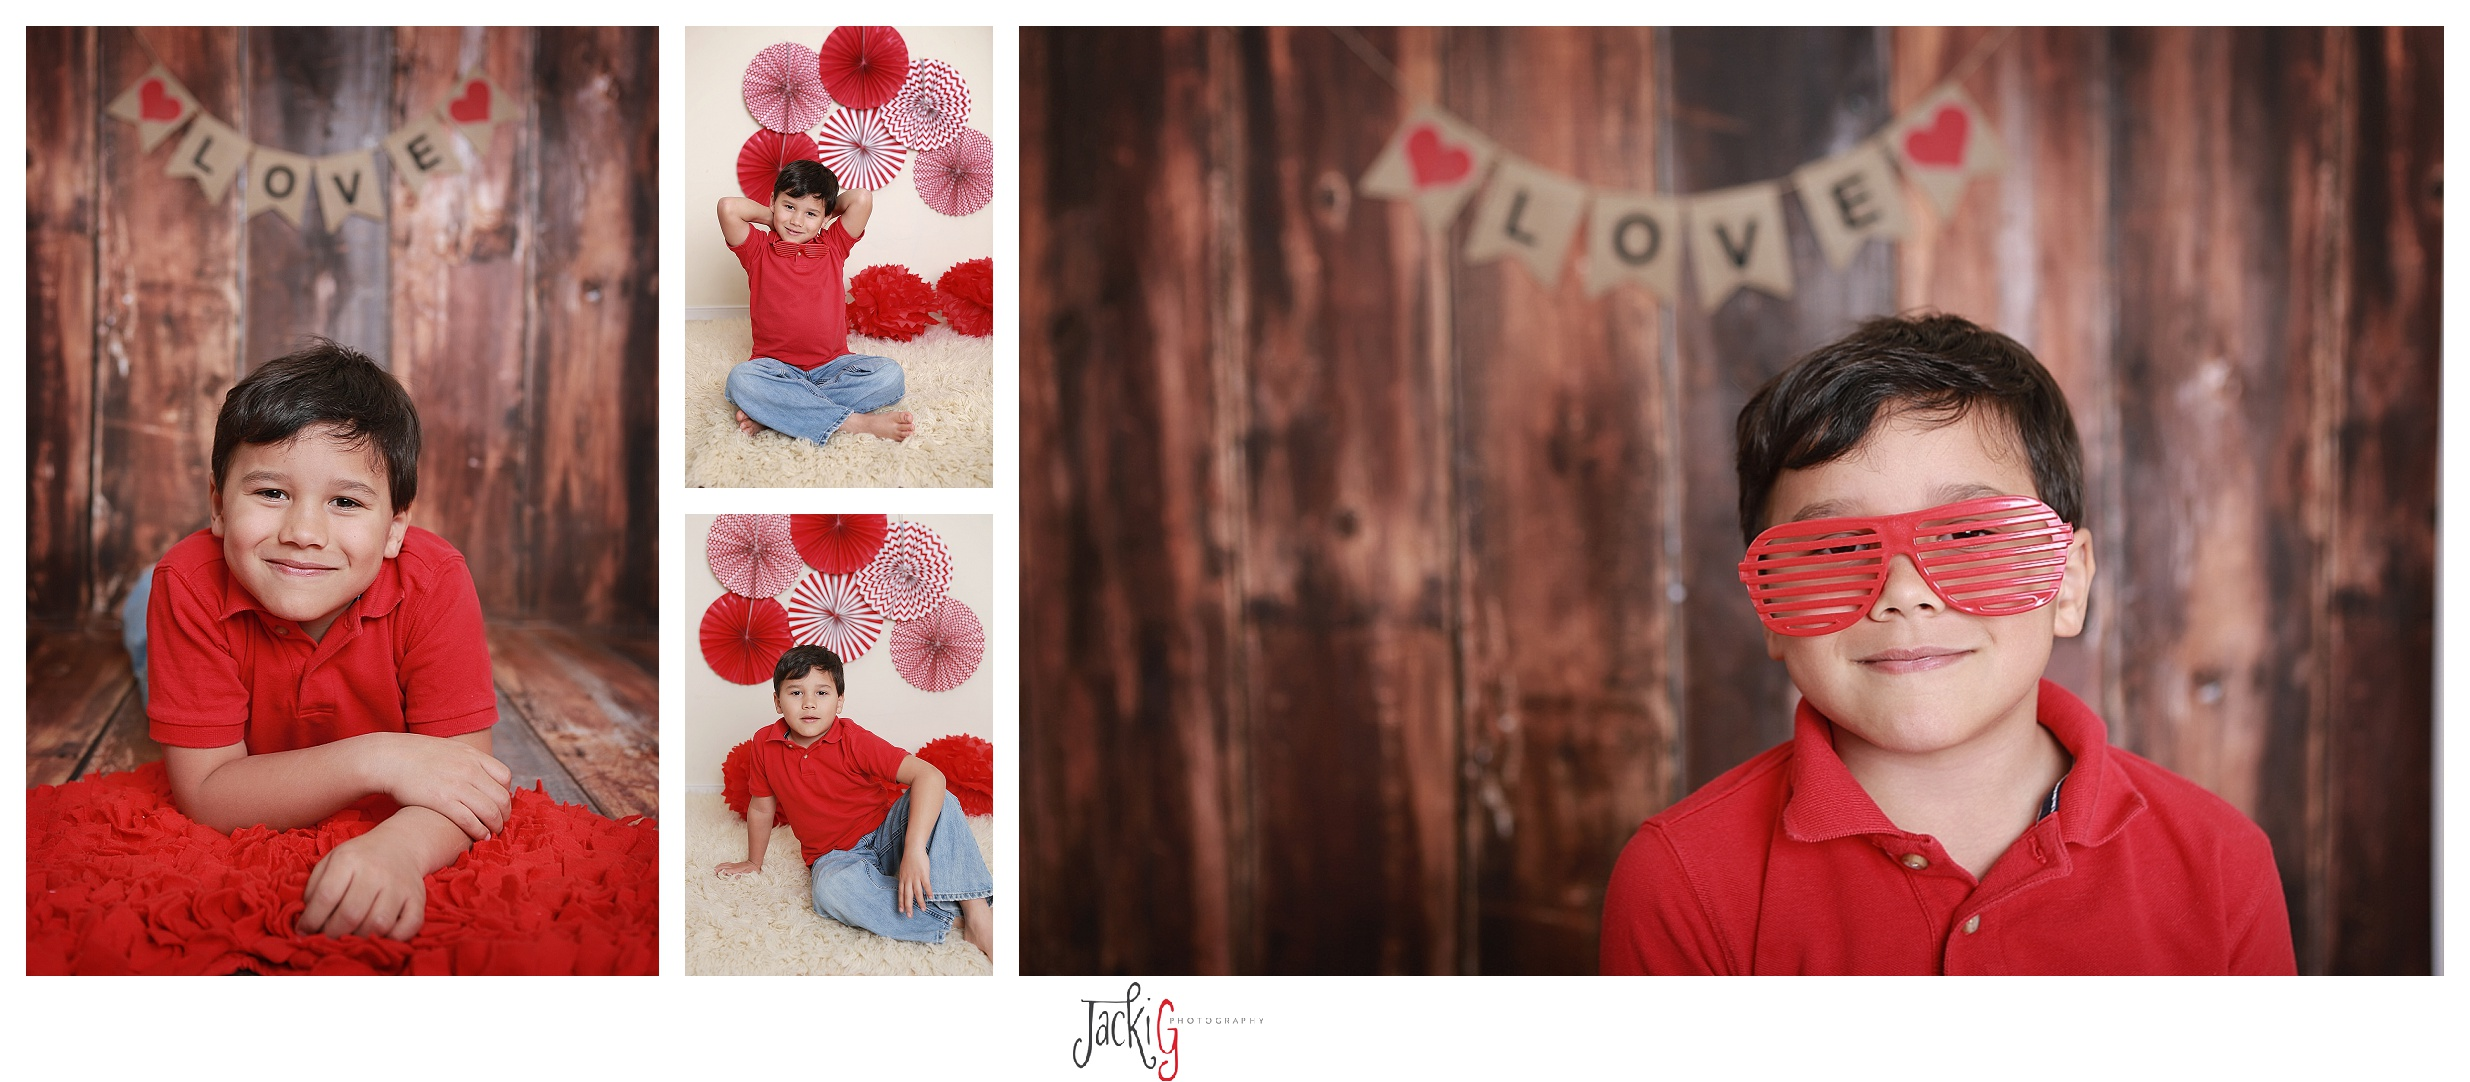 #Valentines #photography #portraits